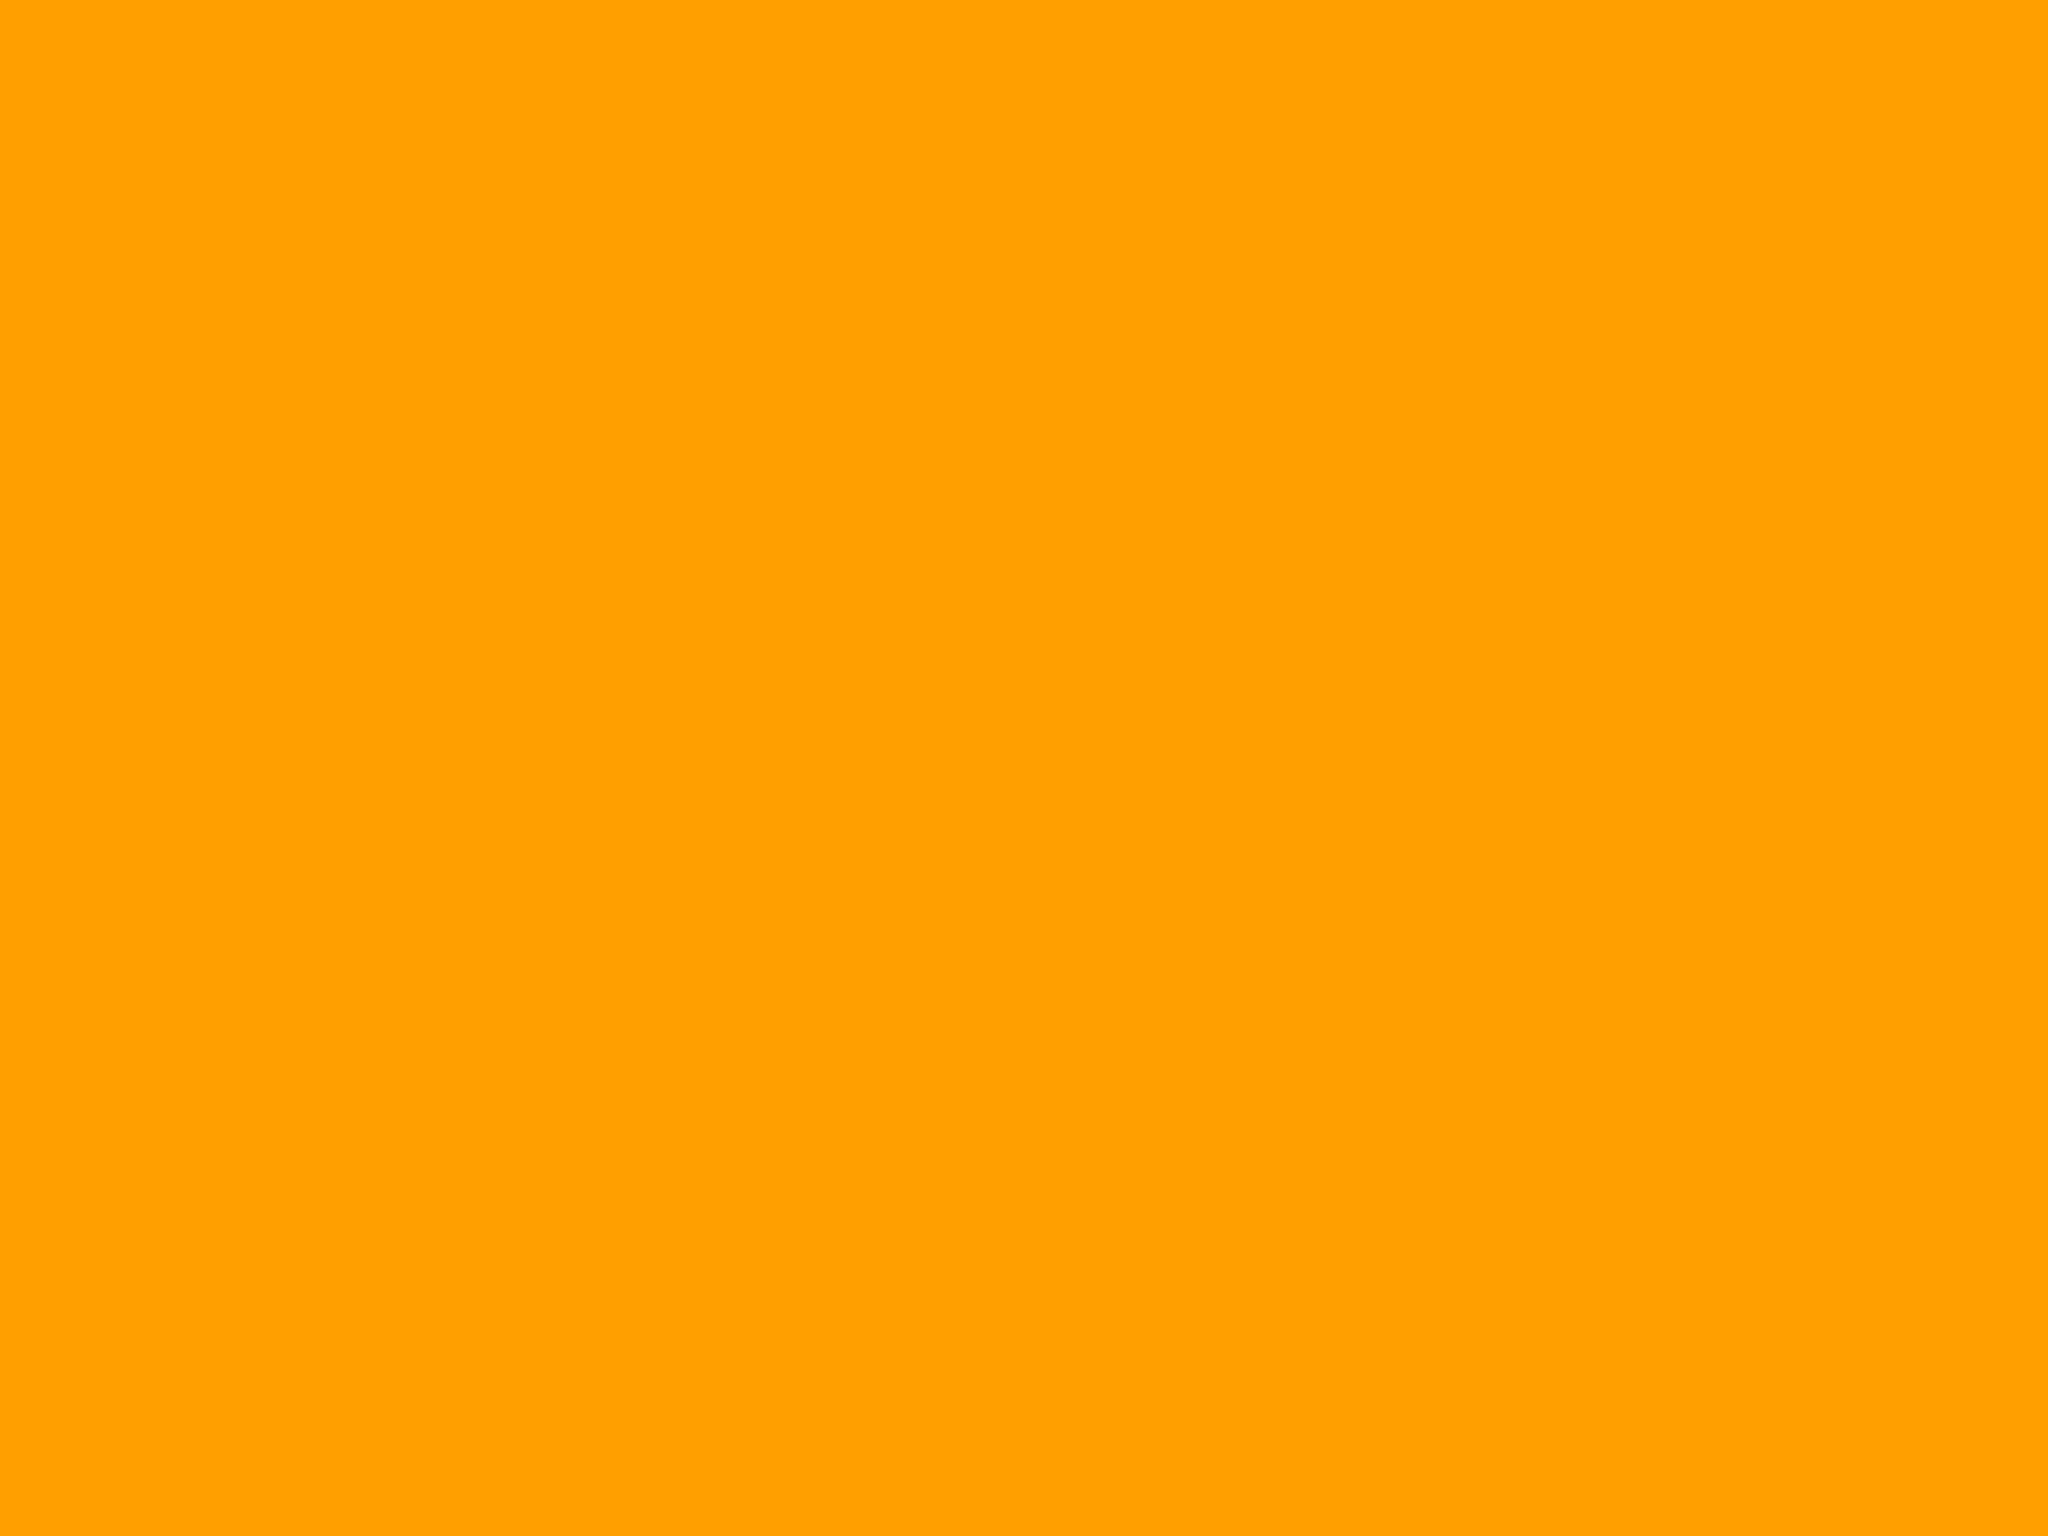 2048x1536 Orange Peel Solid Color Background